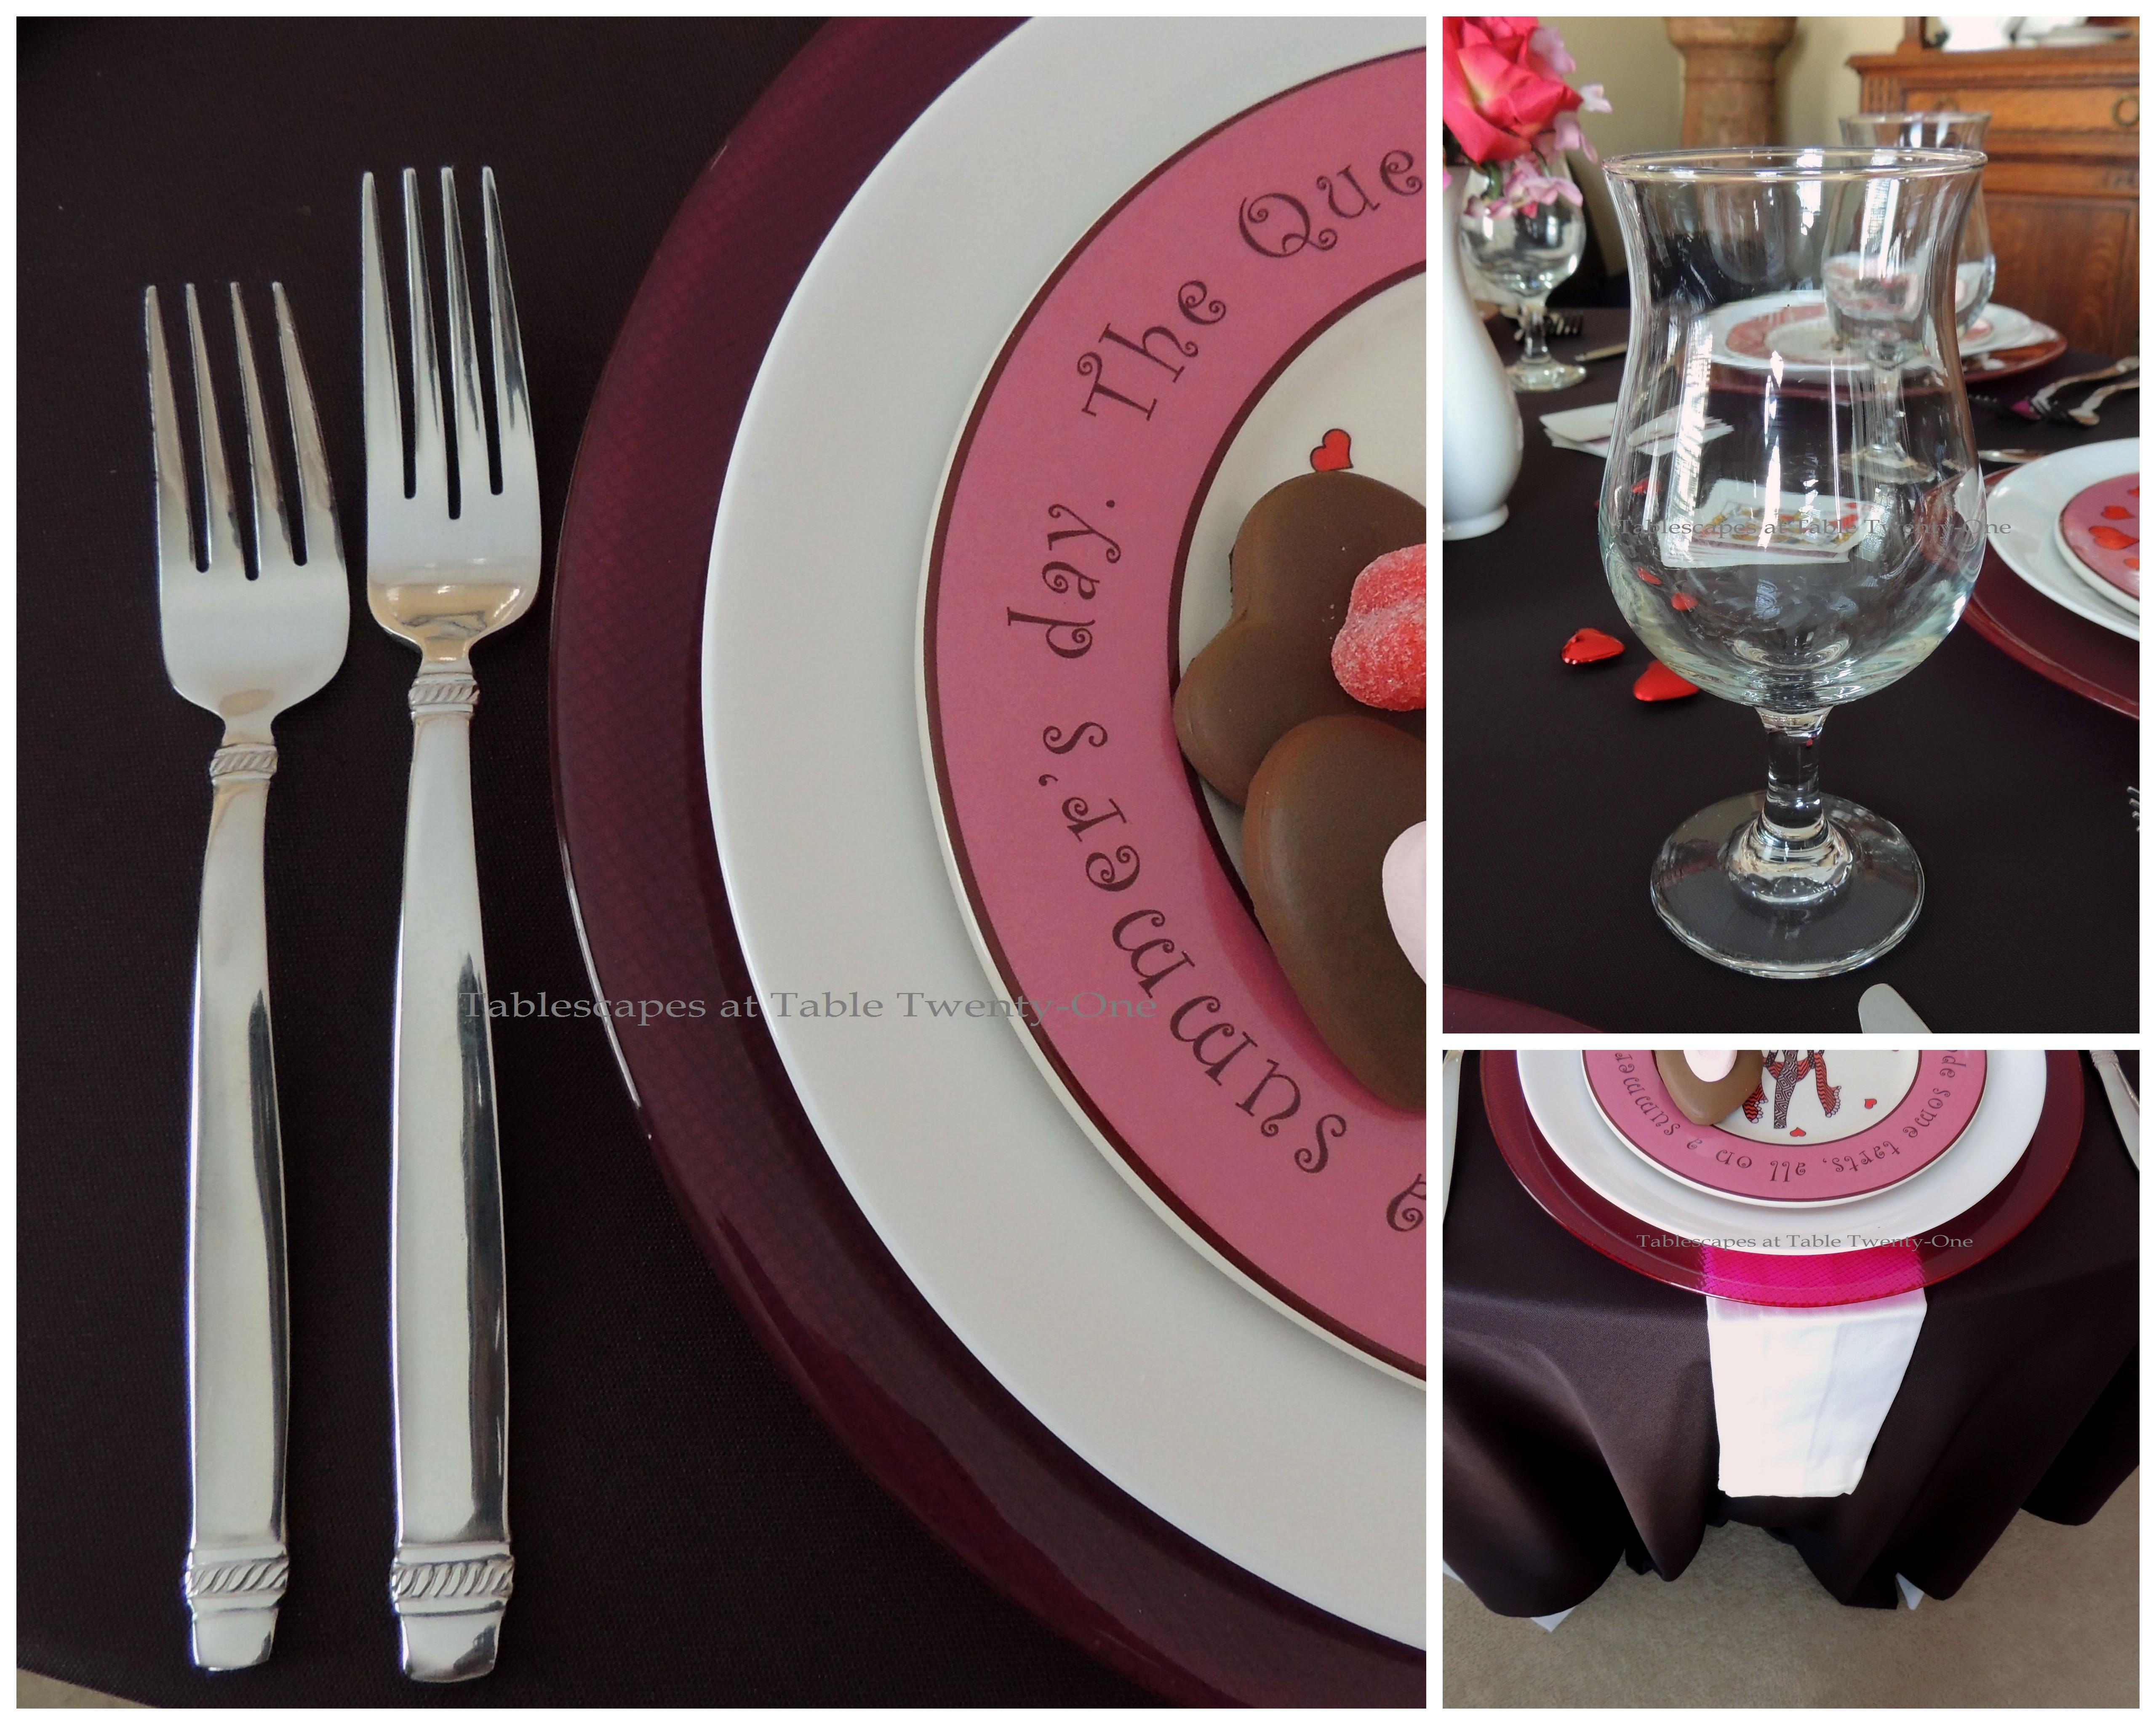 Tablescapes at Table Twenty-One, www.tabletwentyone.wordpress.com, Queen of Hearts Card Party: Flatware, stemware, napkin & rim shot collage